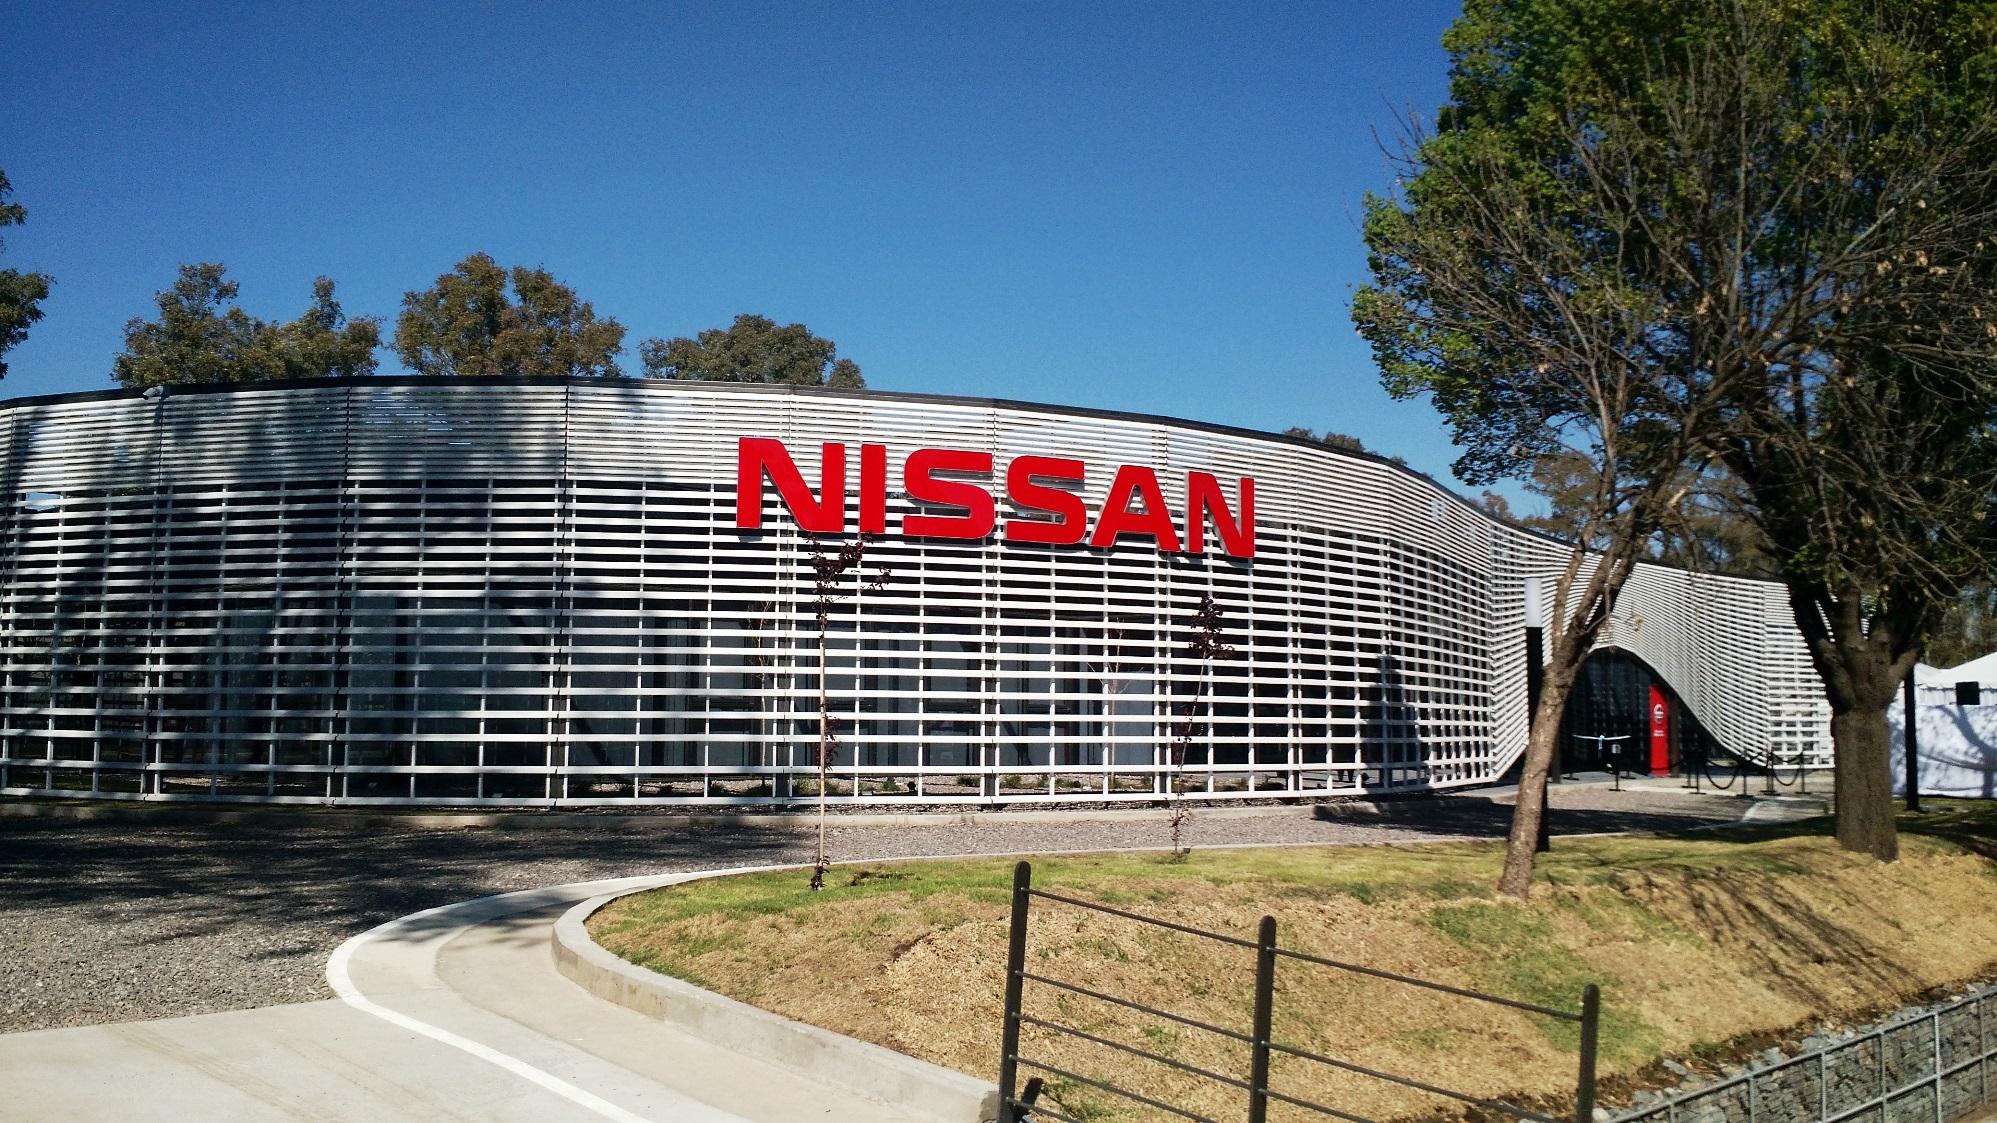 La flamante sede administrativa de Nissan en Córdoba | Foto: Turello.com.ar